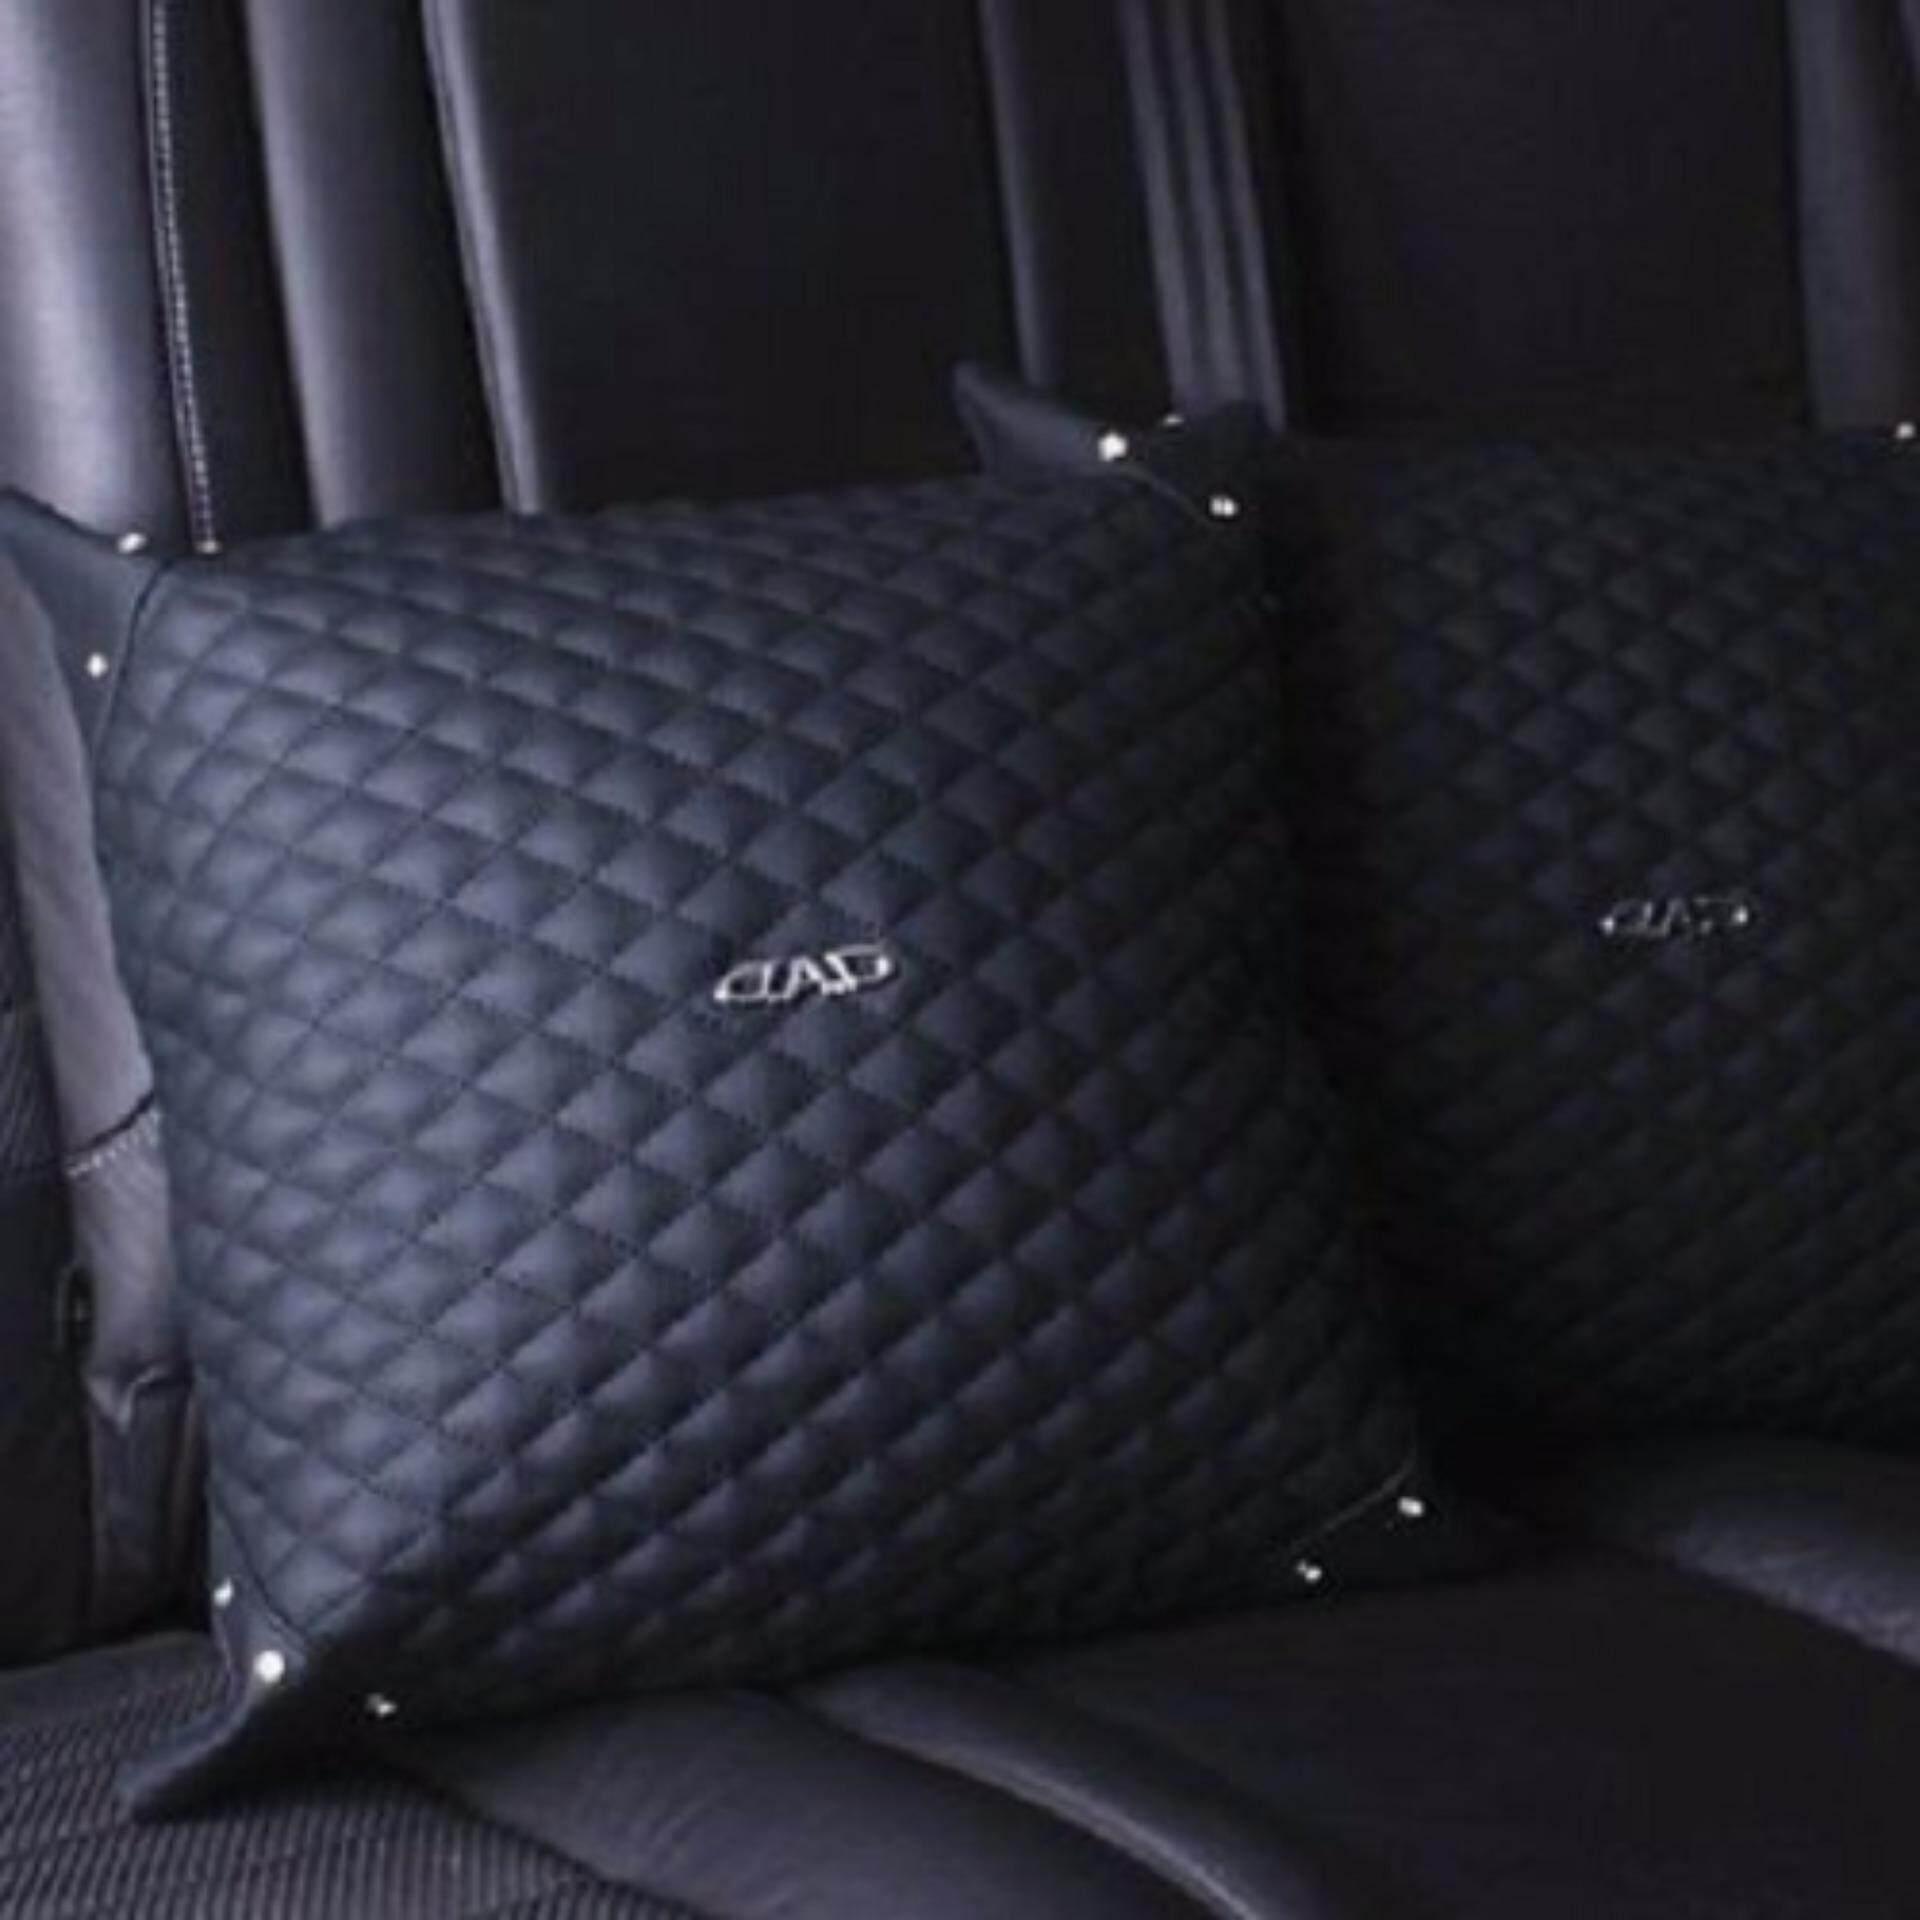 DAD Luxury VIP Leather Car Sofa Cushion ( 2 pcs )